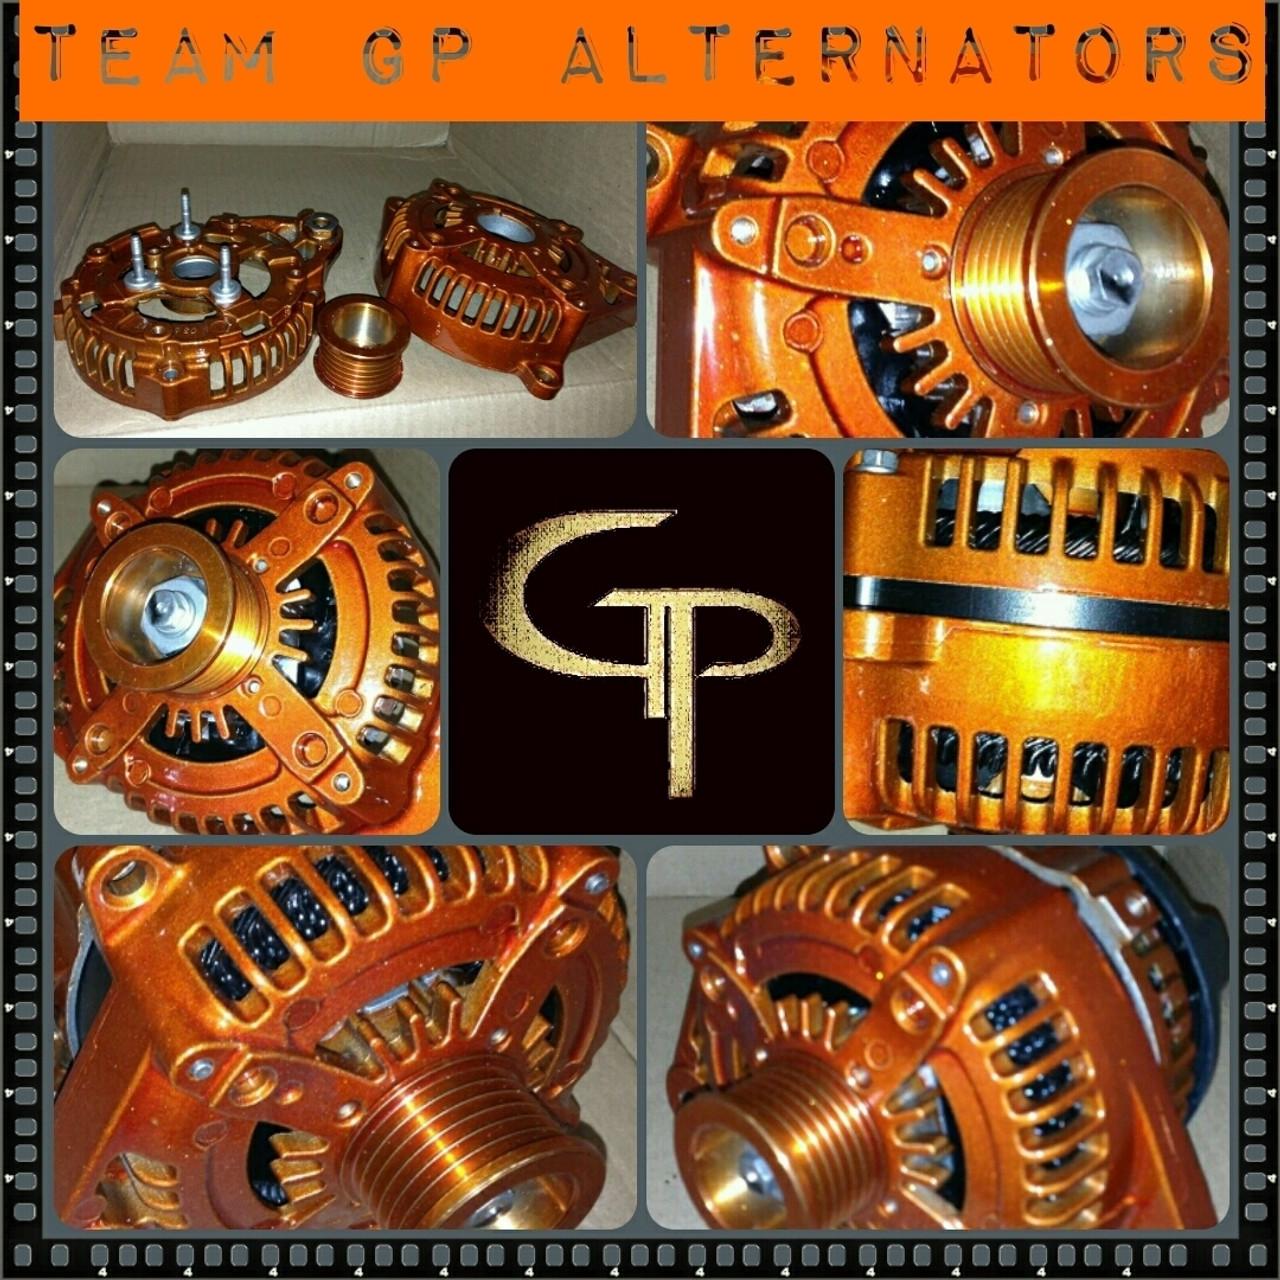 TOYOTA TACOMA 4.0 -2005-2011- 300AMP TEAM GP Alternator